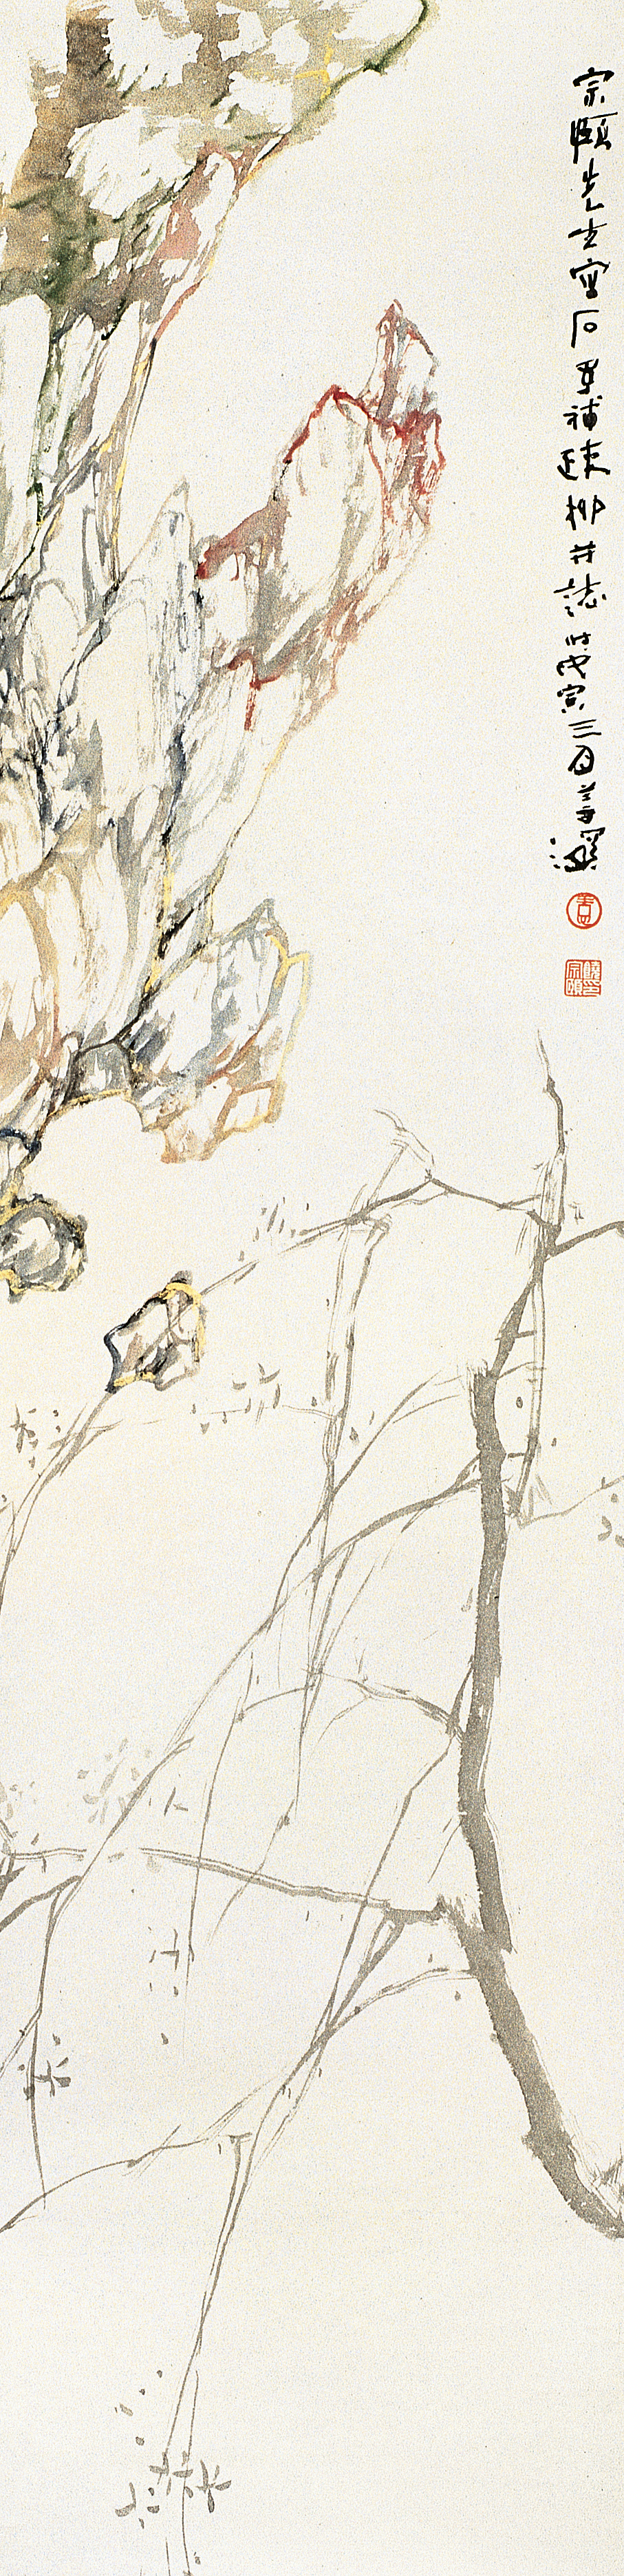 Jao Tsung-I   Yang Shan-shen